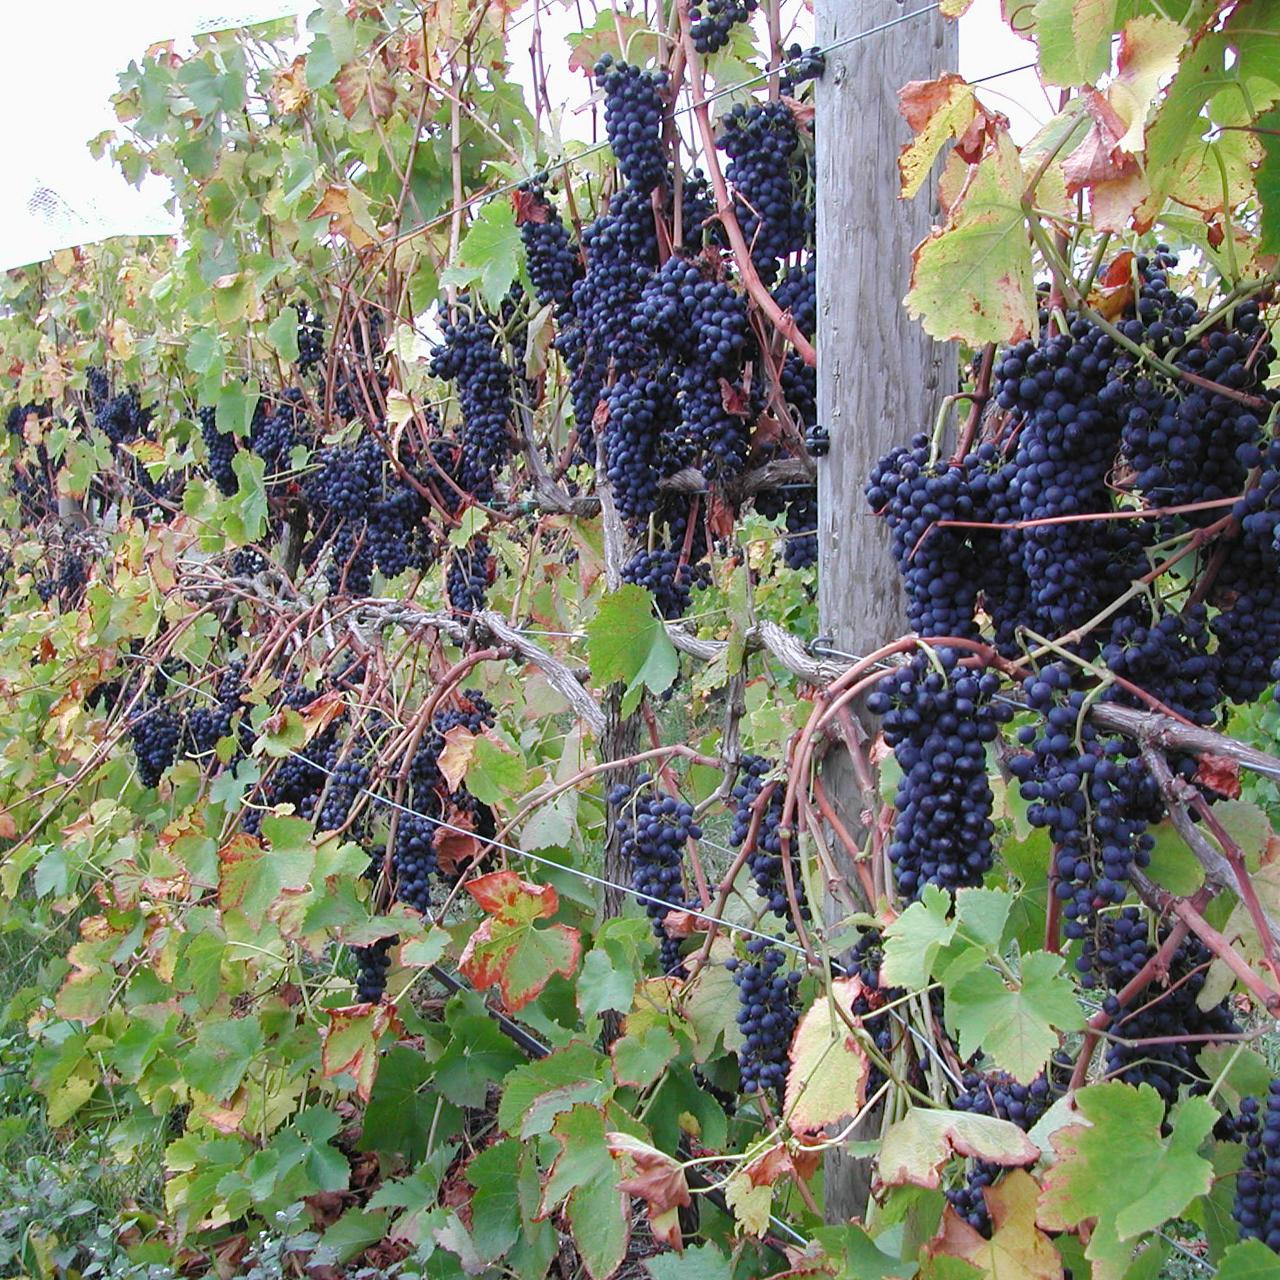 Shiraz grapes, 2003 vintage